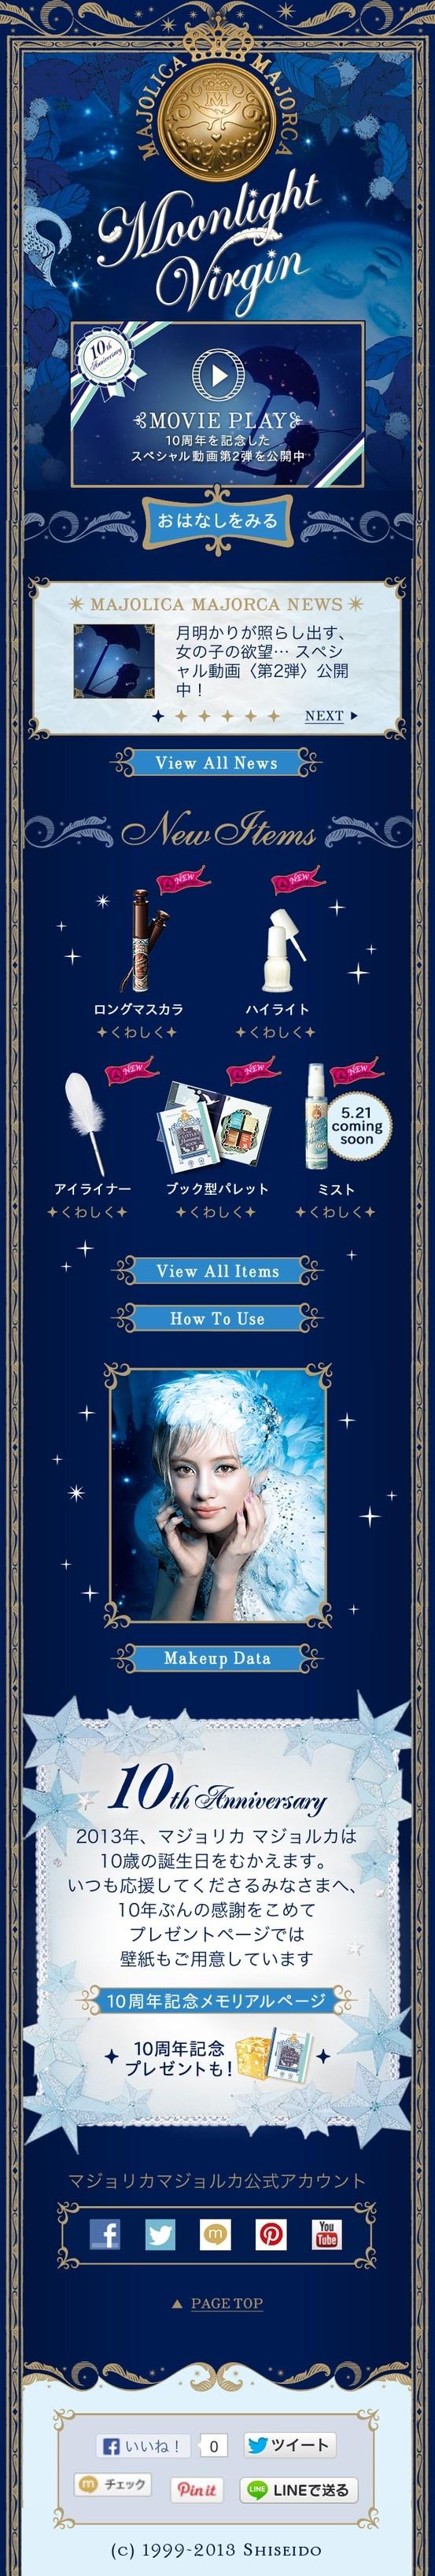 http://www.shiseido.co.jp/mj/index.html